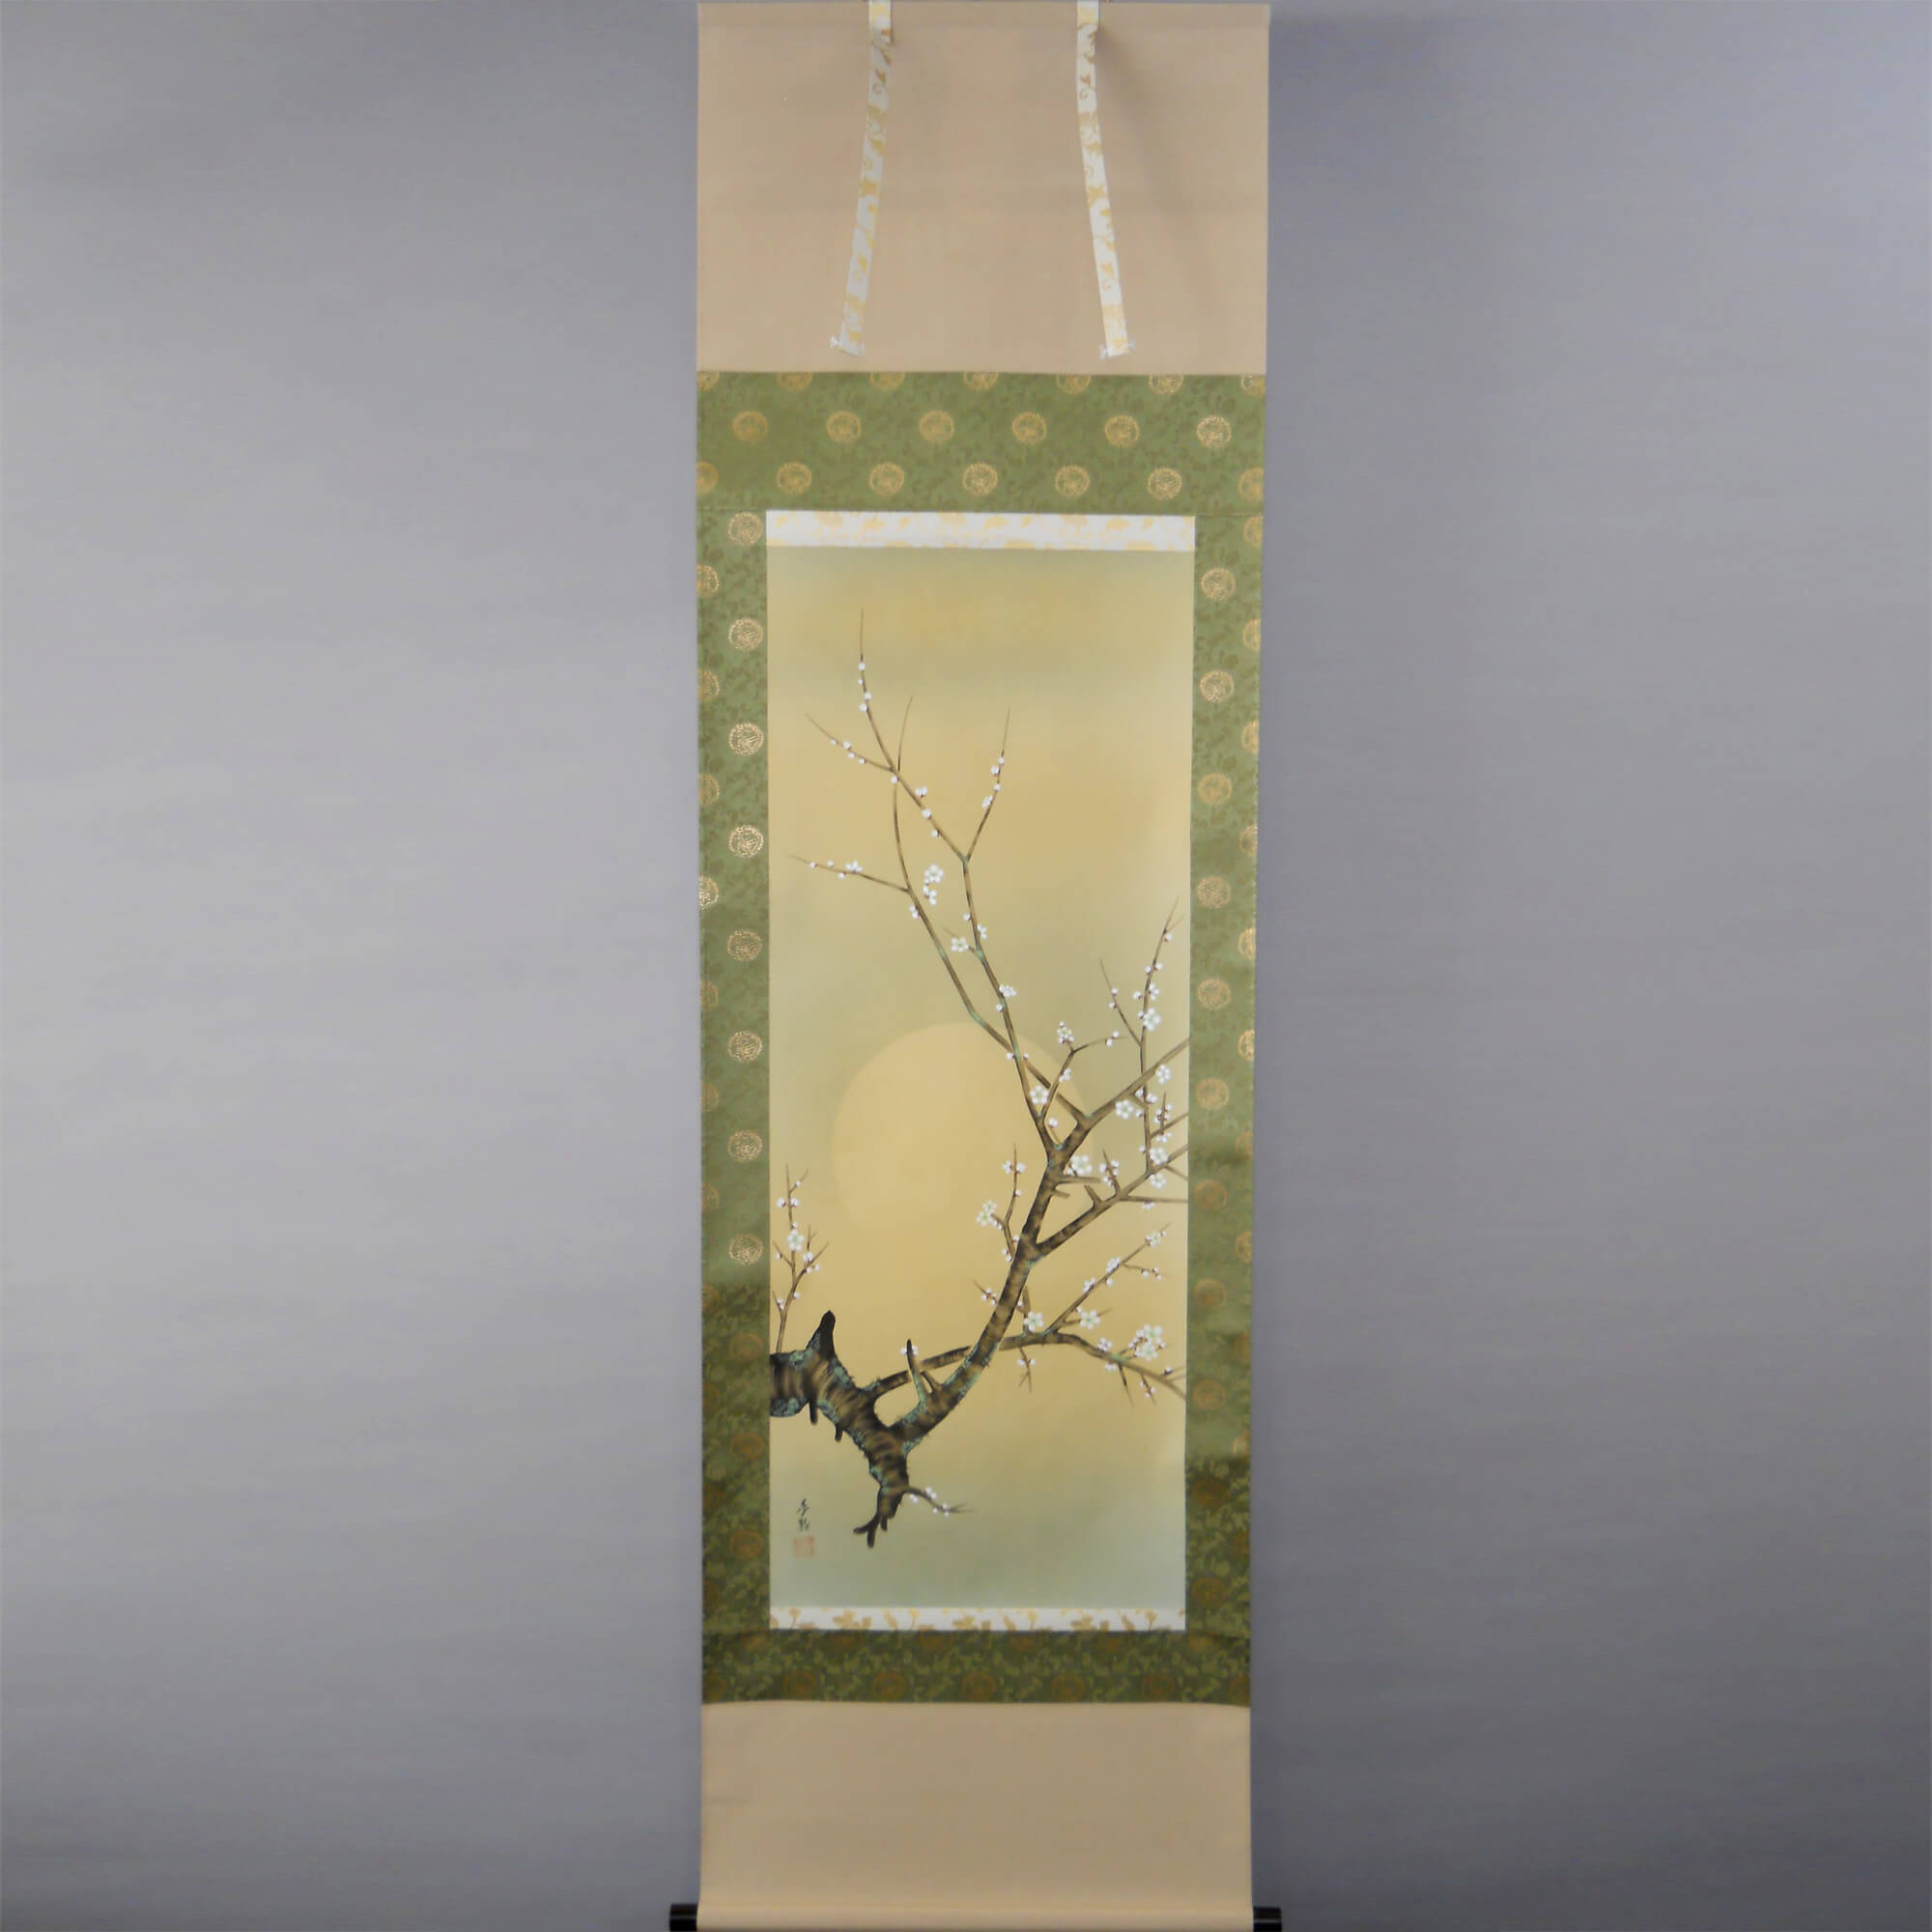 Plum Blossoms with the Moon / Kinoshita Yumeji